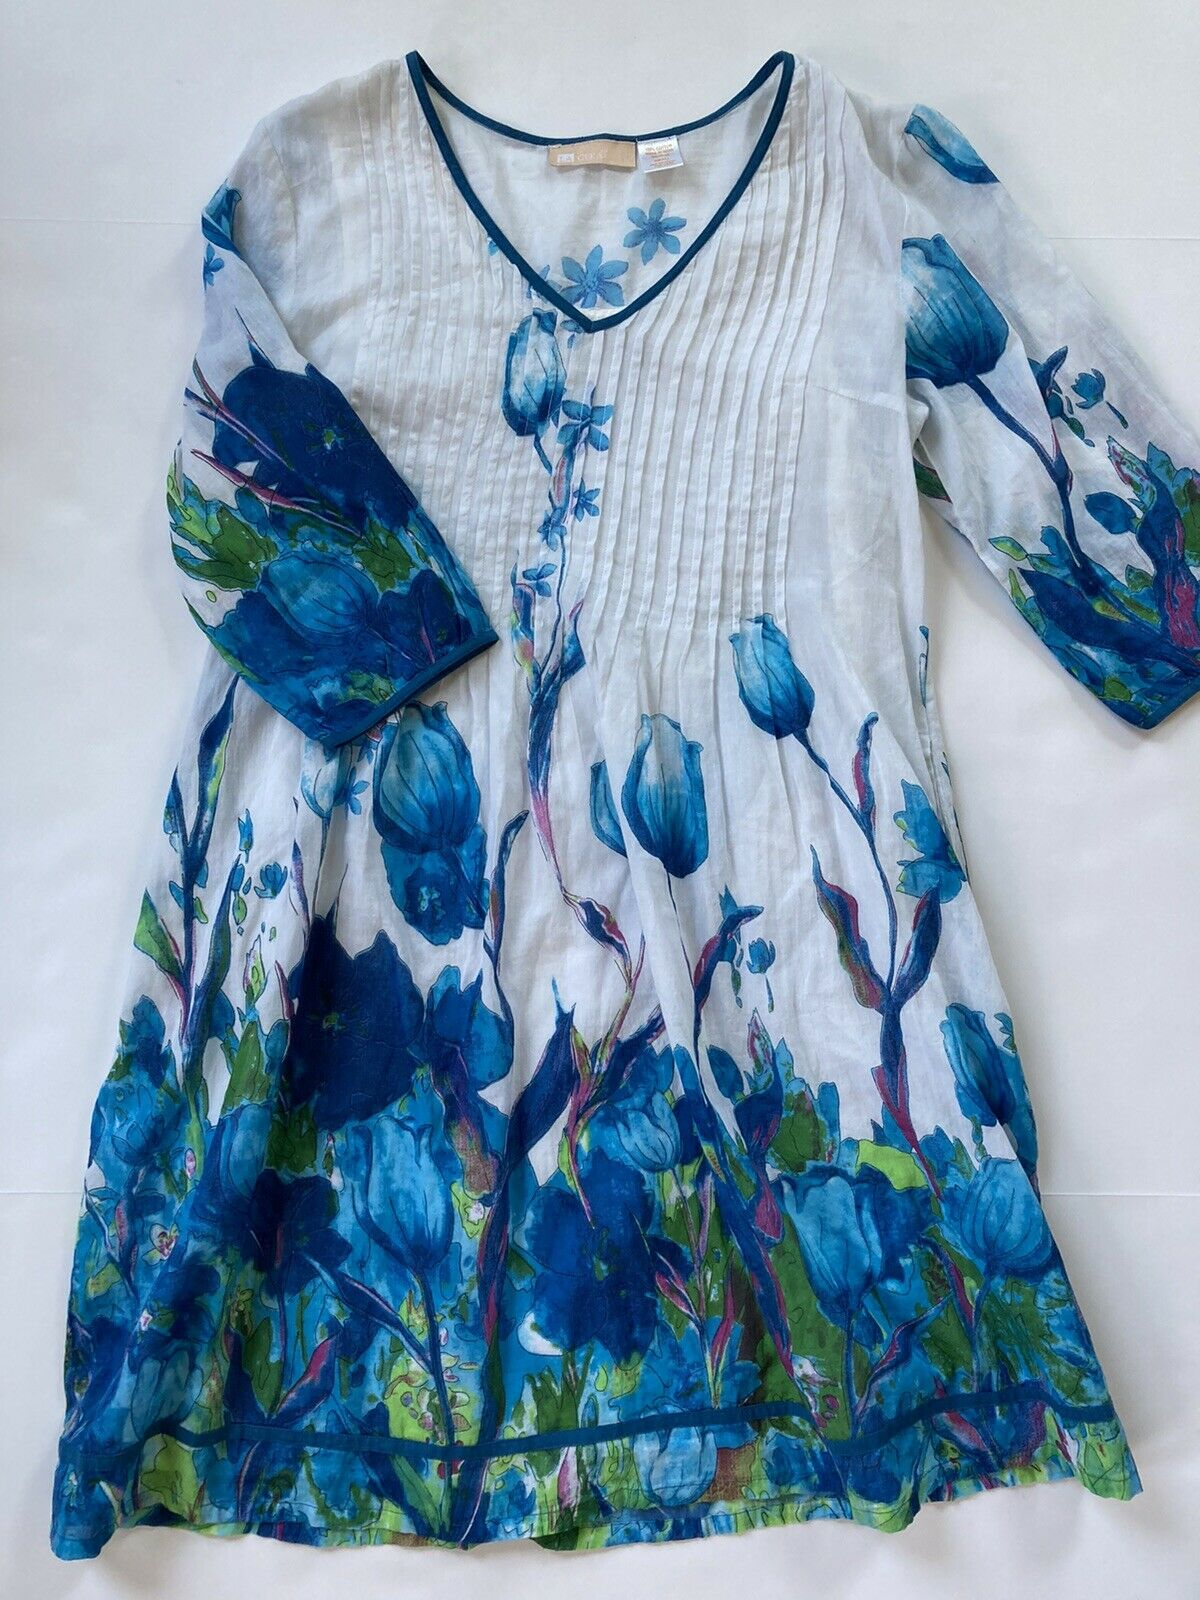 LA CERA Tulip Print Pleated Cotton Tunic Dress - image 1